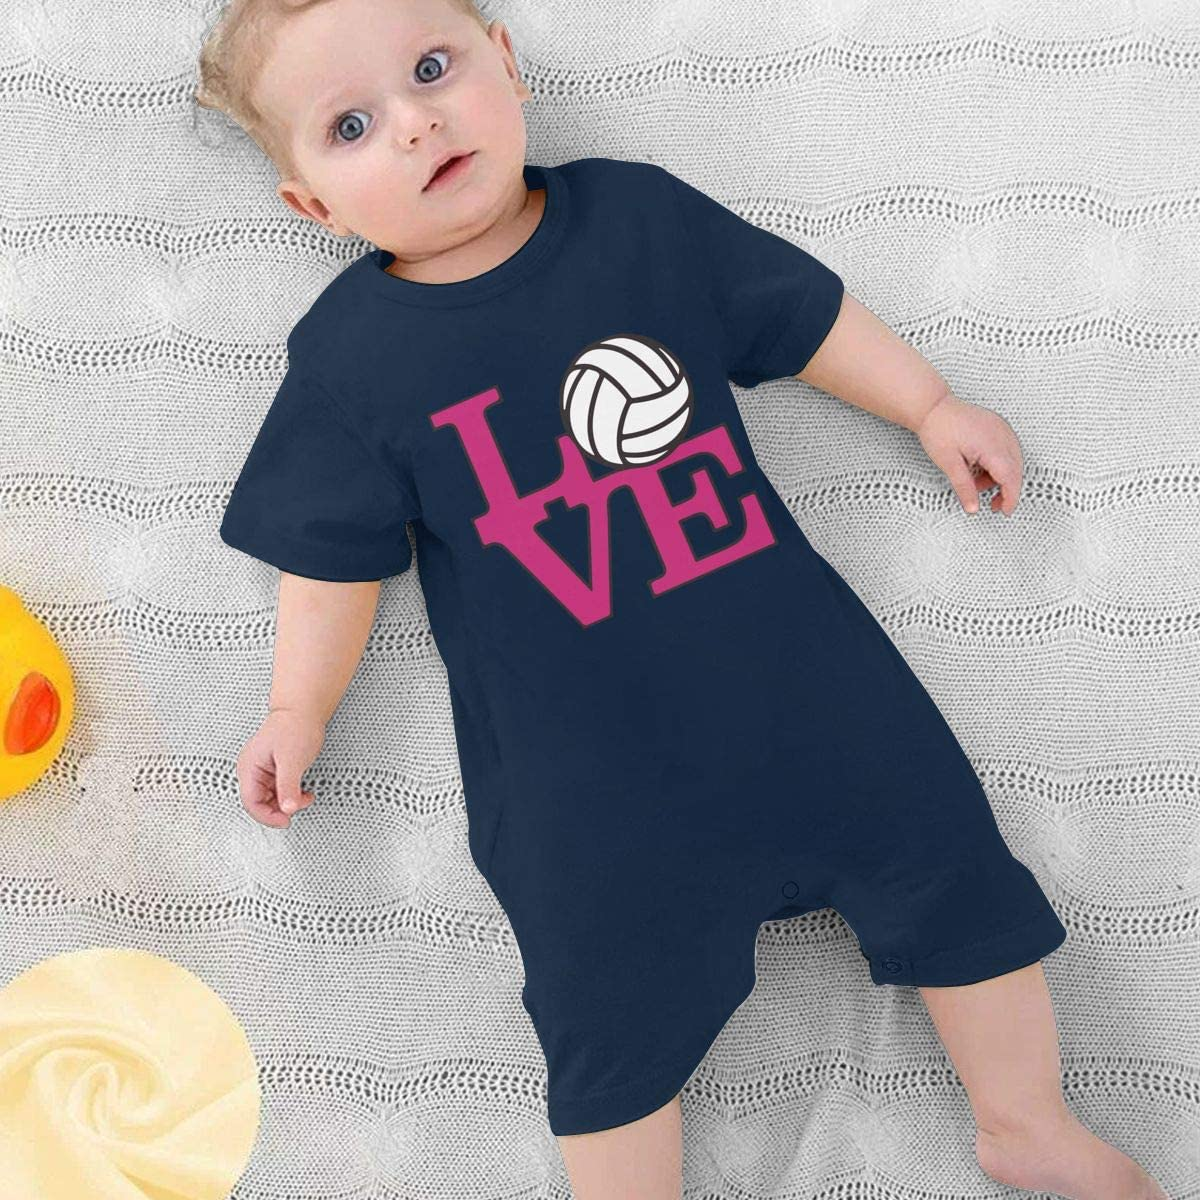 Mermaid Sloth Cute Good Vibes Newborn Kids Short Sleeve Bodysuit Baby Clothes 0-24 Months